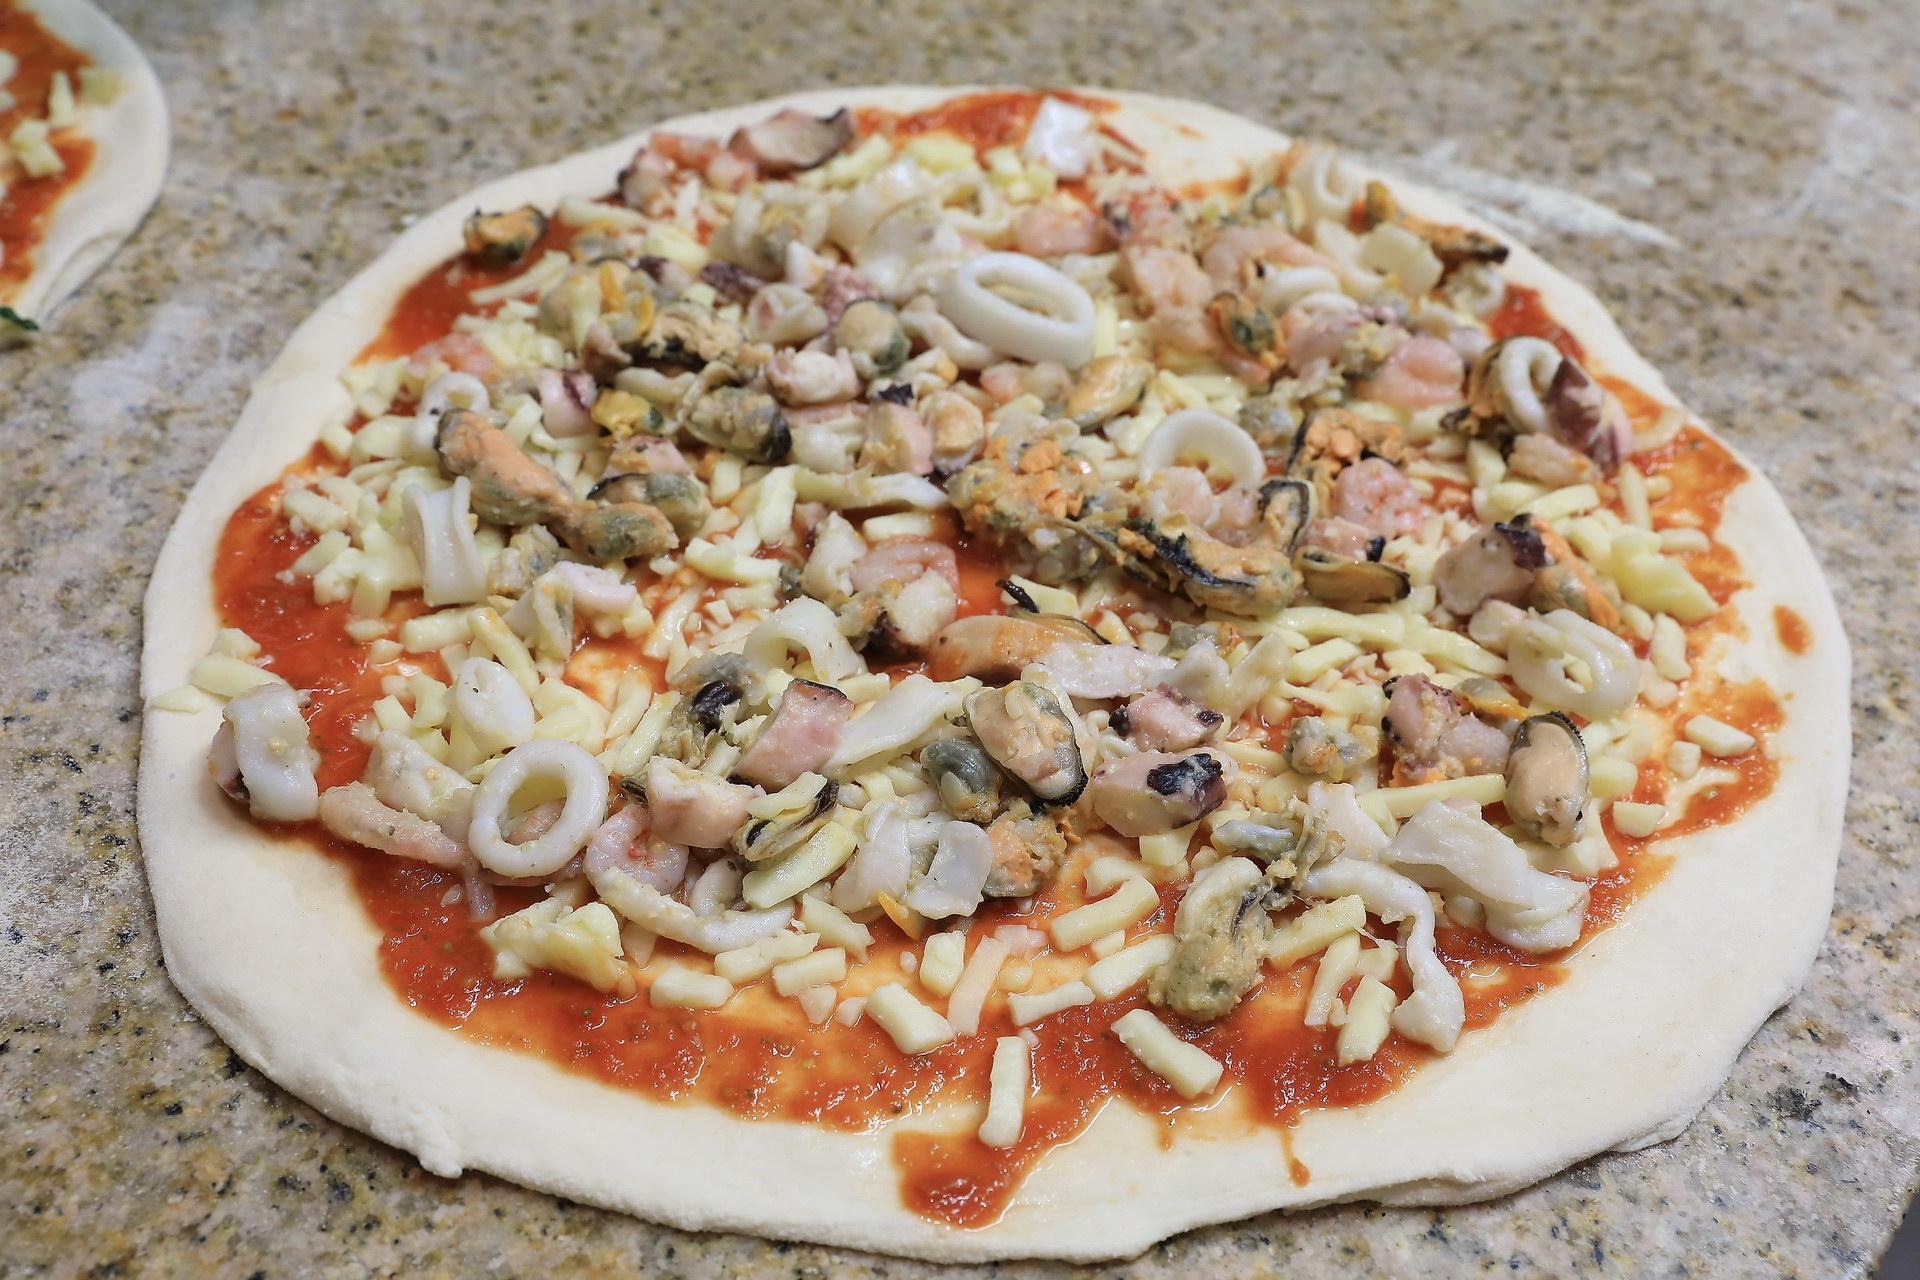 Le-Mediterraneen-Pizza-Braine-l-Alleud-0012.jpg